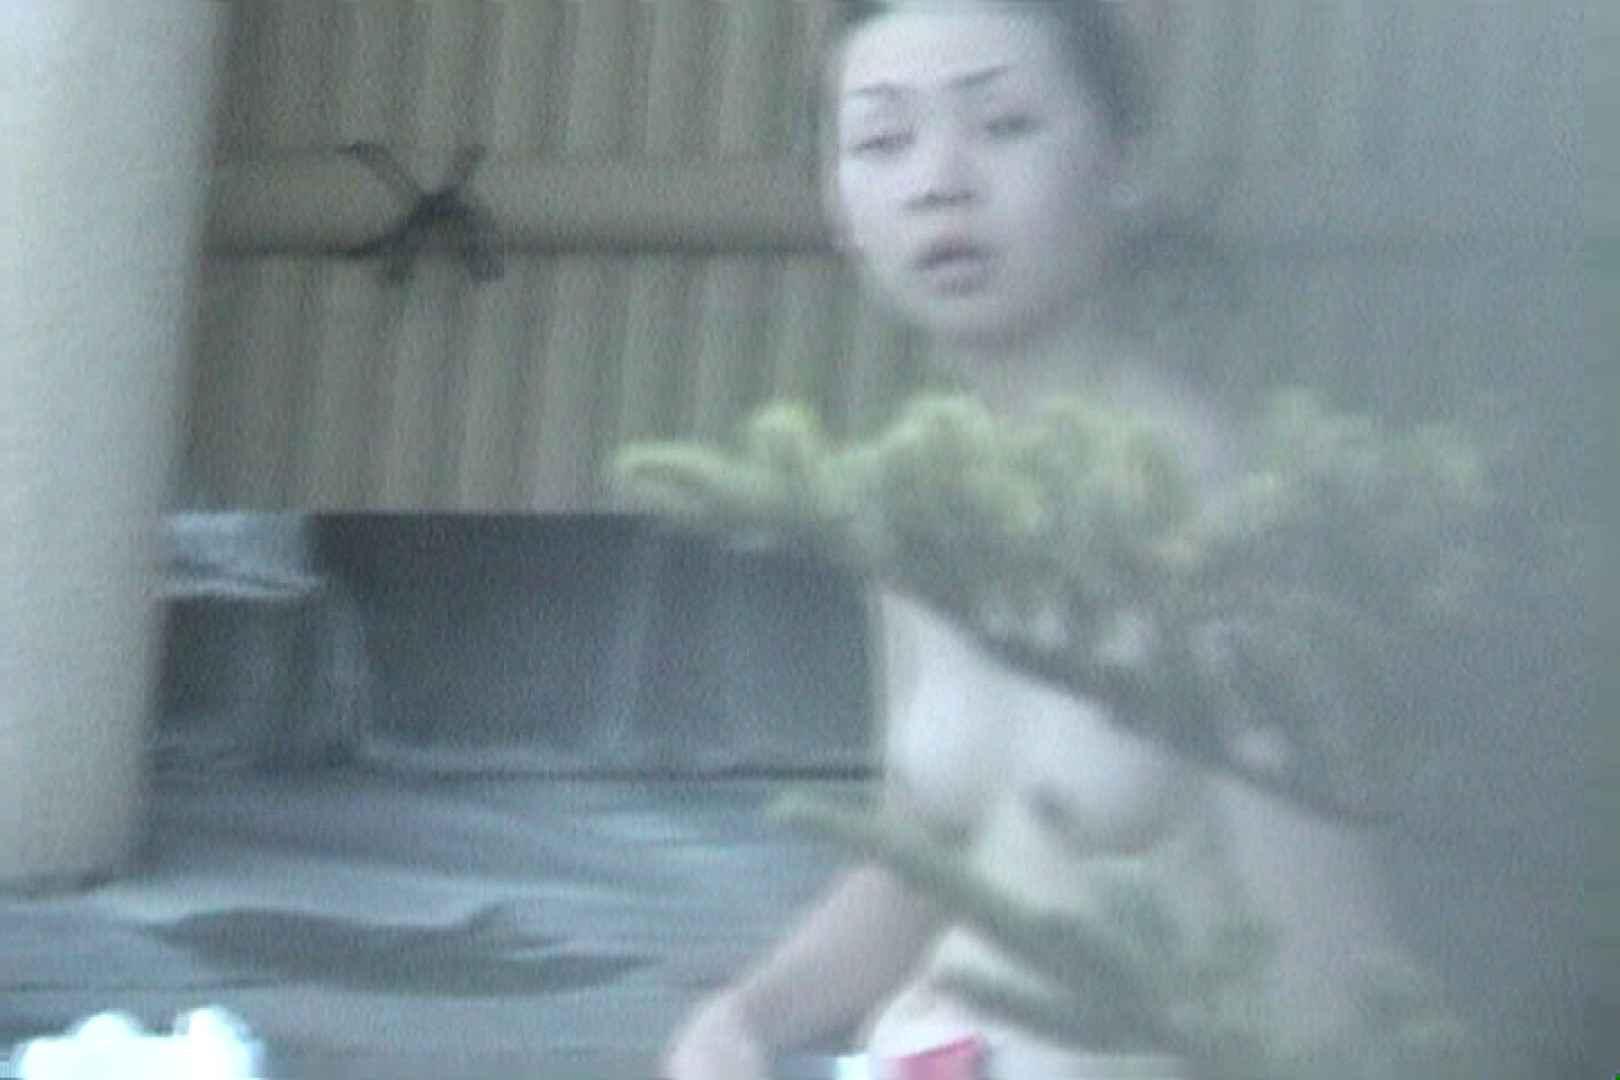 Aquaな露天風呂Vol.643 露天風呂編 | 盗撮シリーズ  88PIX 61